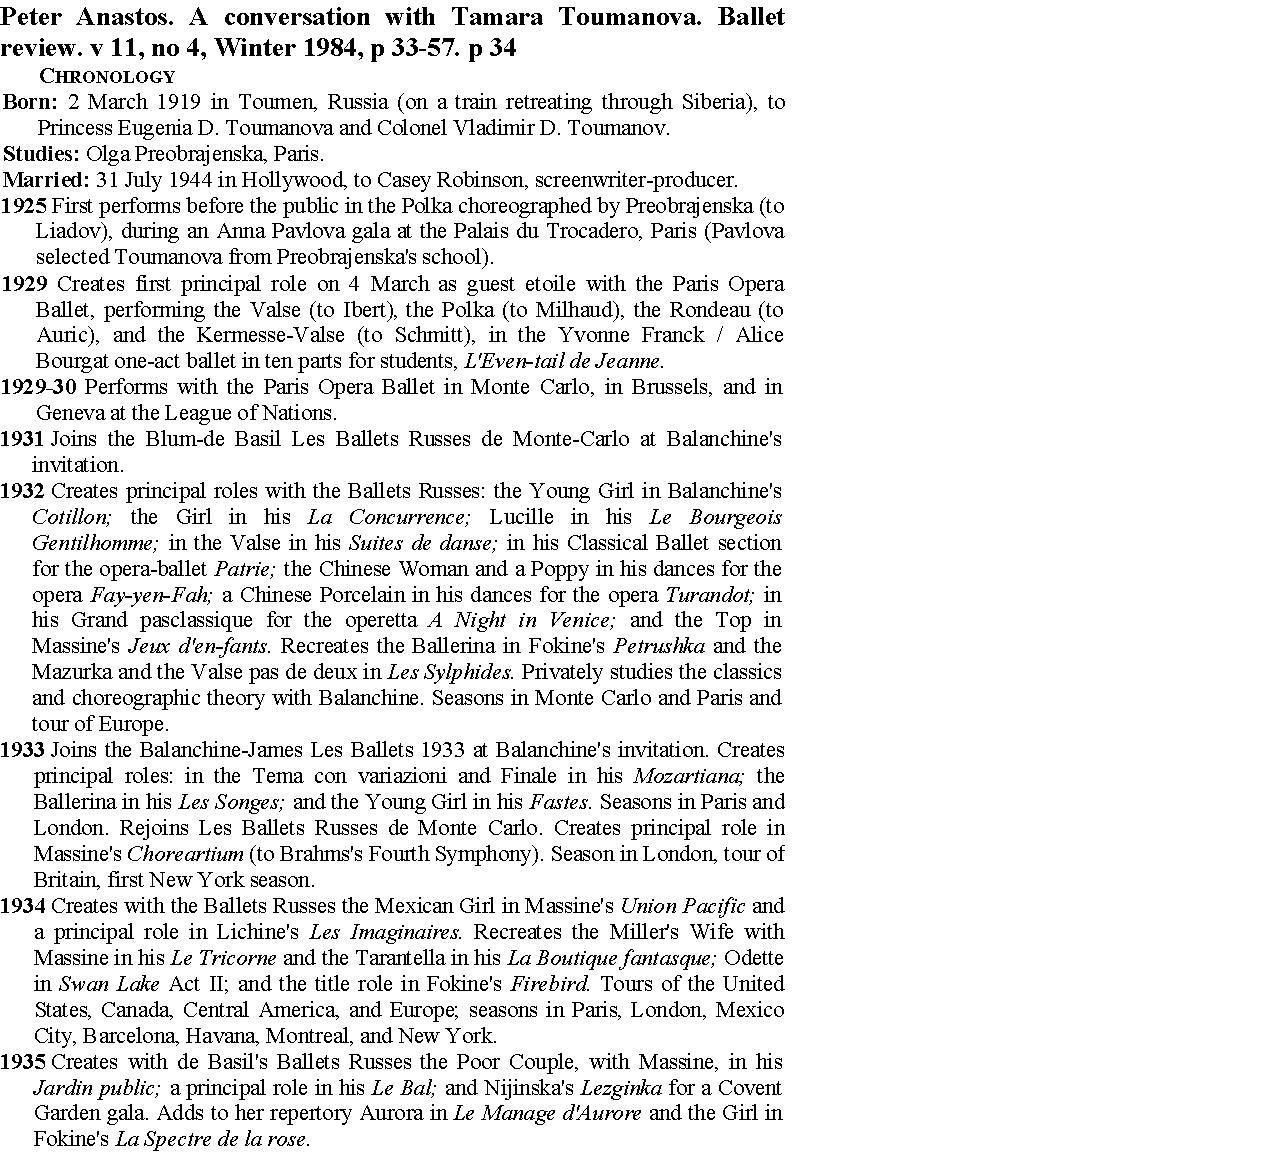 Photo: Peter Anastos. A conversation with Tamara Toumanova. Peter Anastos. Ballet review. v 11, no 4, Winter 1984, p 33-57 Петер Анастос. Разговор с Тамарой Тумановой.  Март 1983 – Беверли Хиллс, Калифорния, США